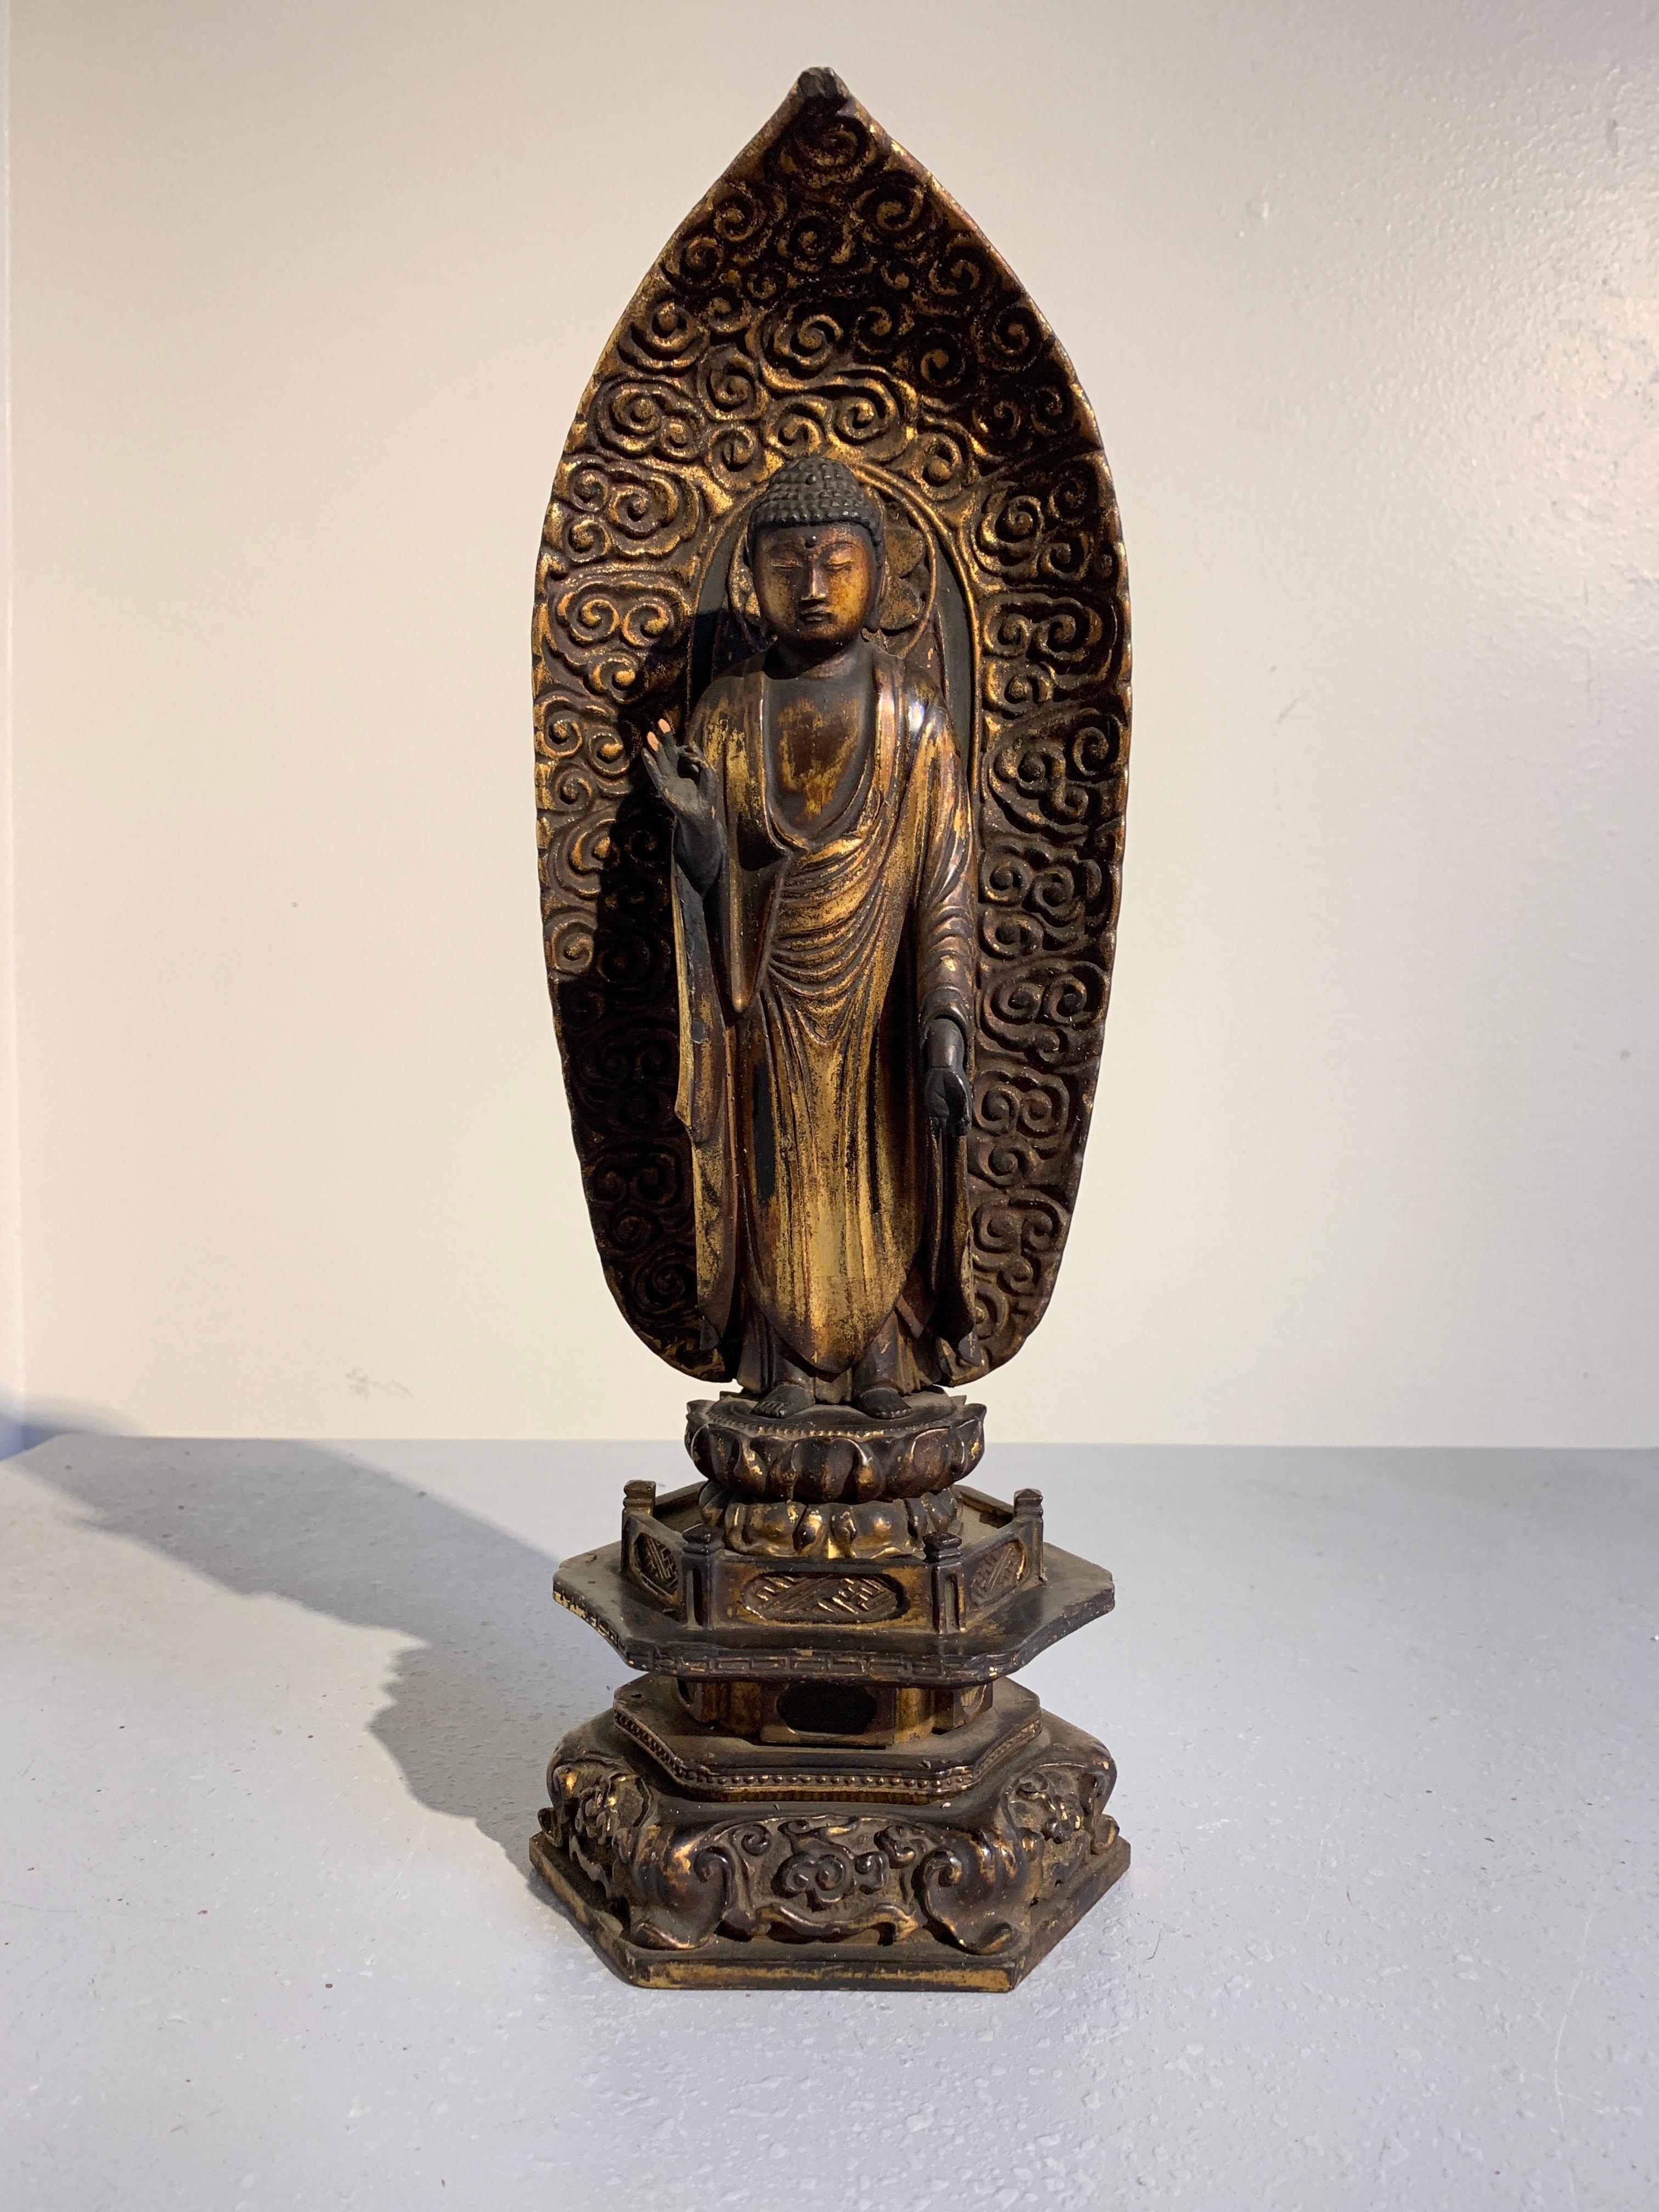 Asiatika: Indien & Himalaya Antiquitäten & Kunst Antik Japanische Paar Geschnitztem Holz Bemalten Figuren Statuen Buddhist Nio